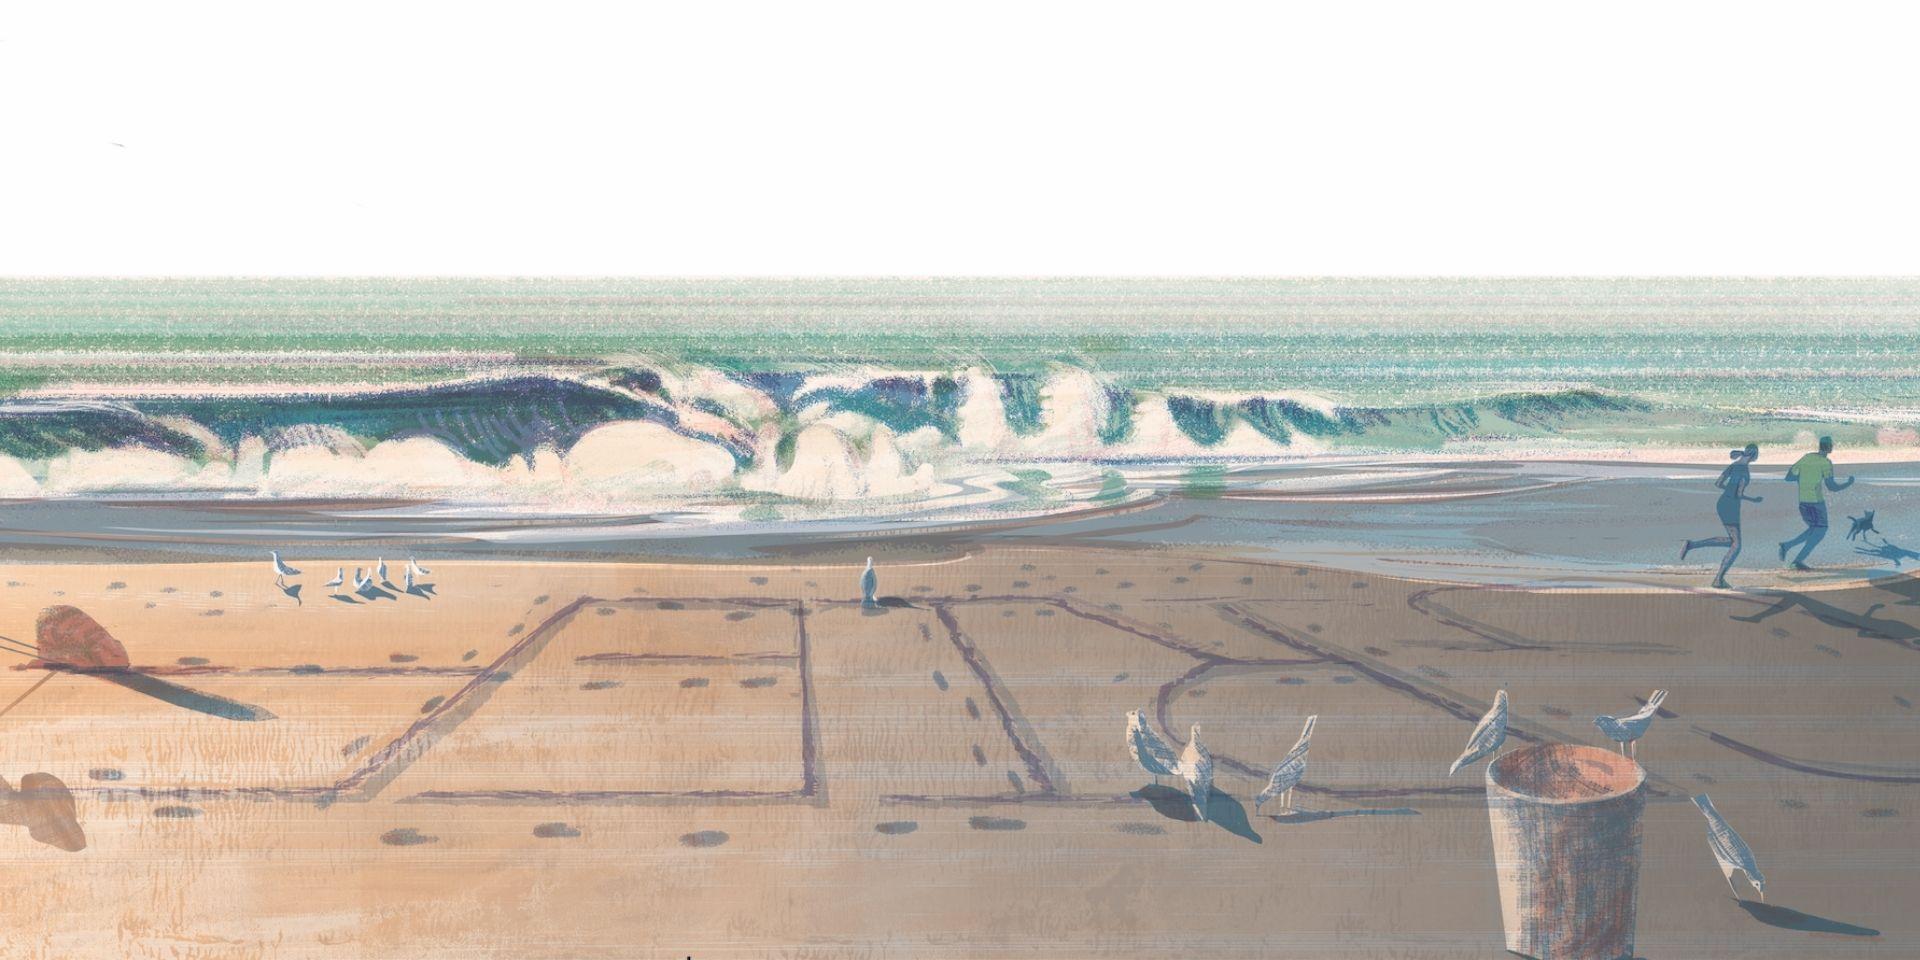 Grief Beach